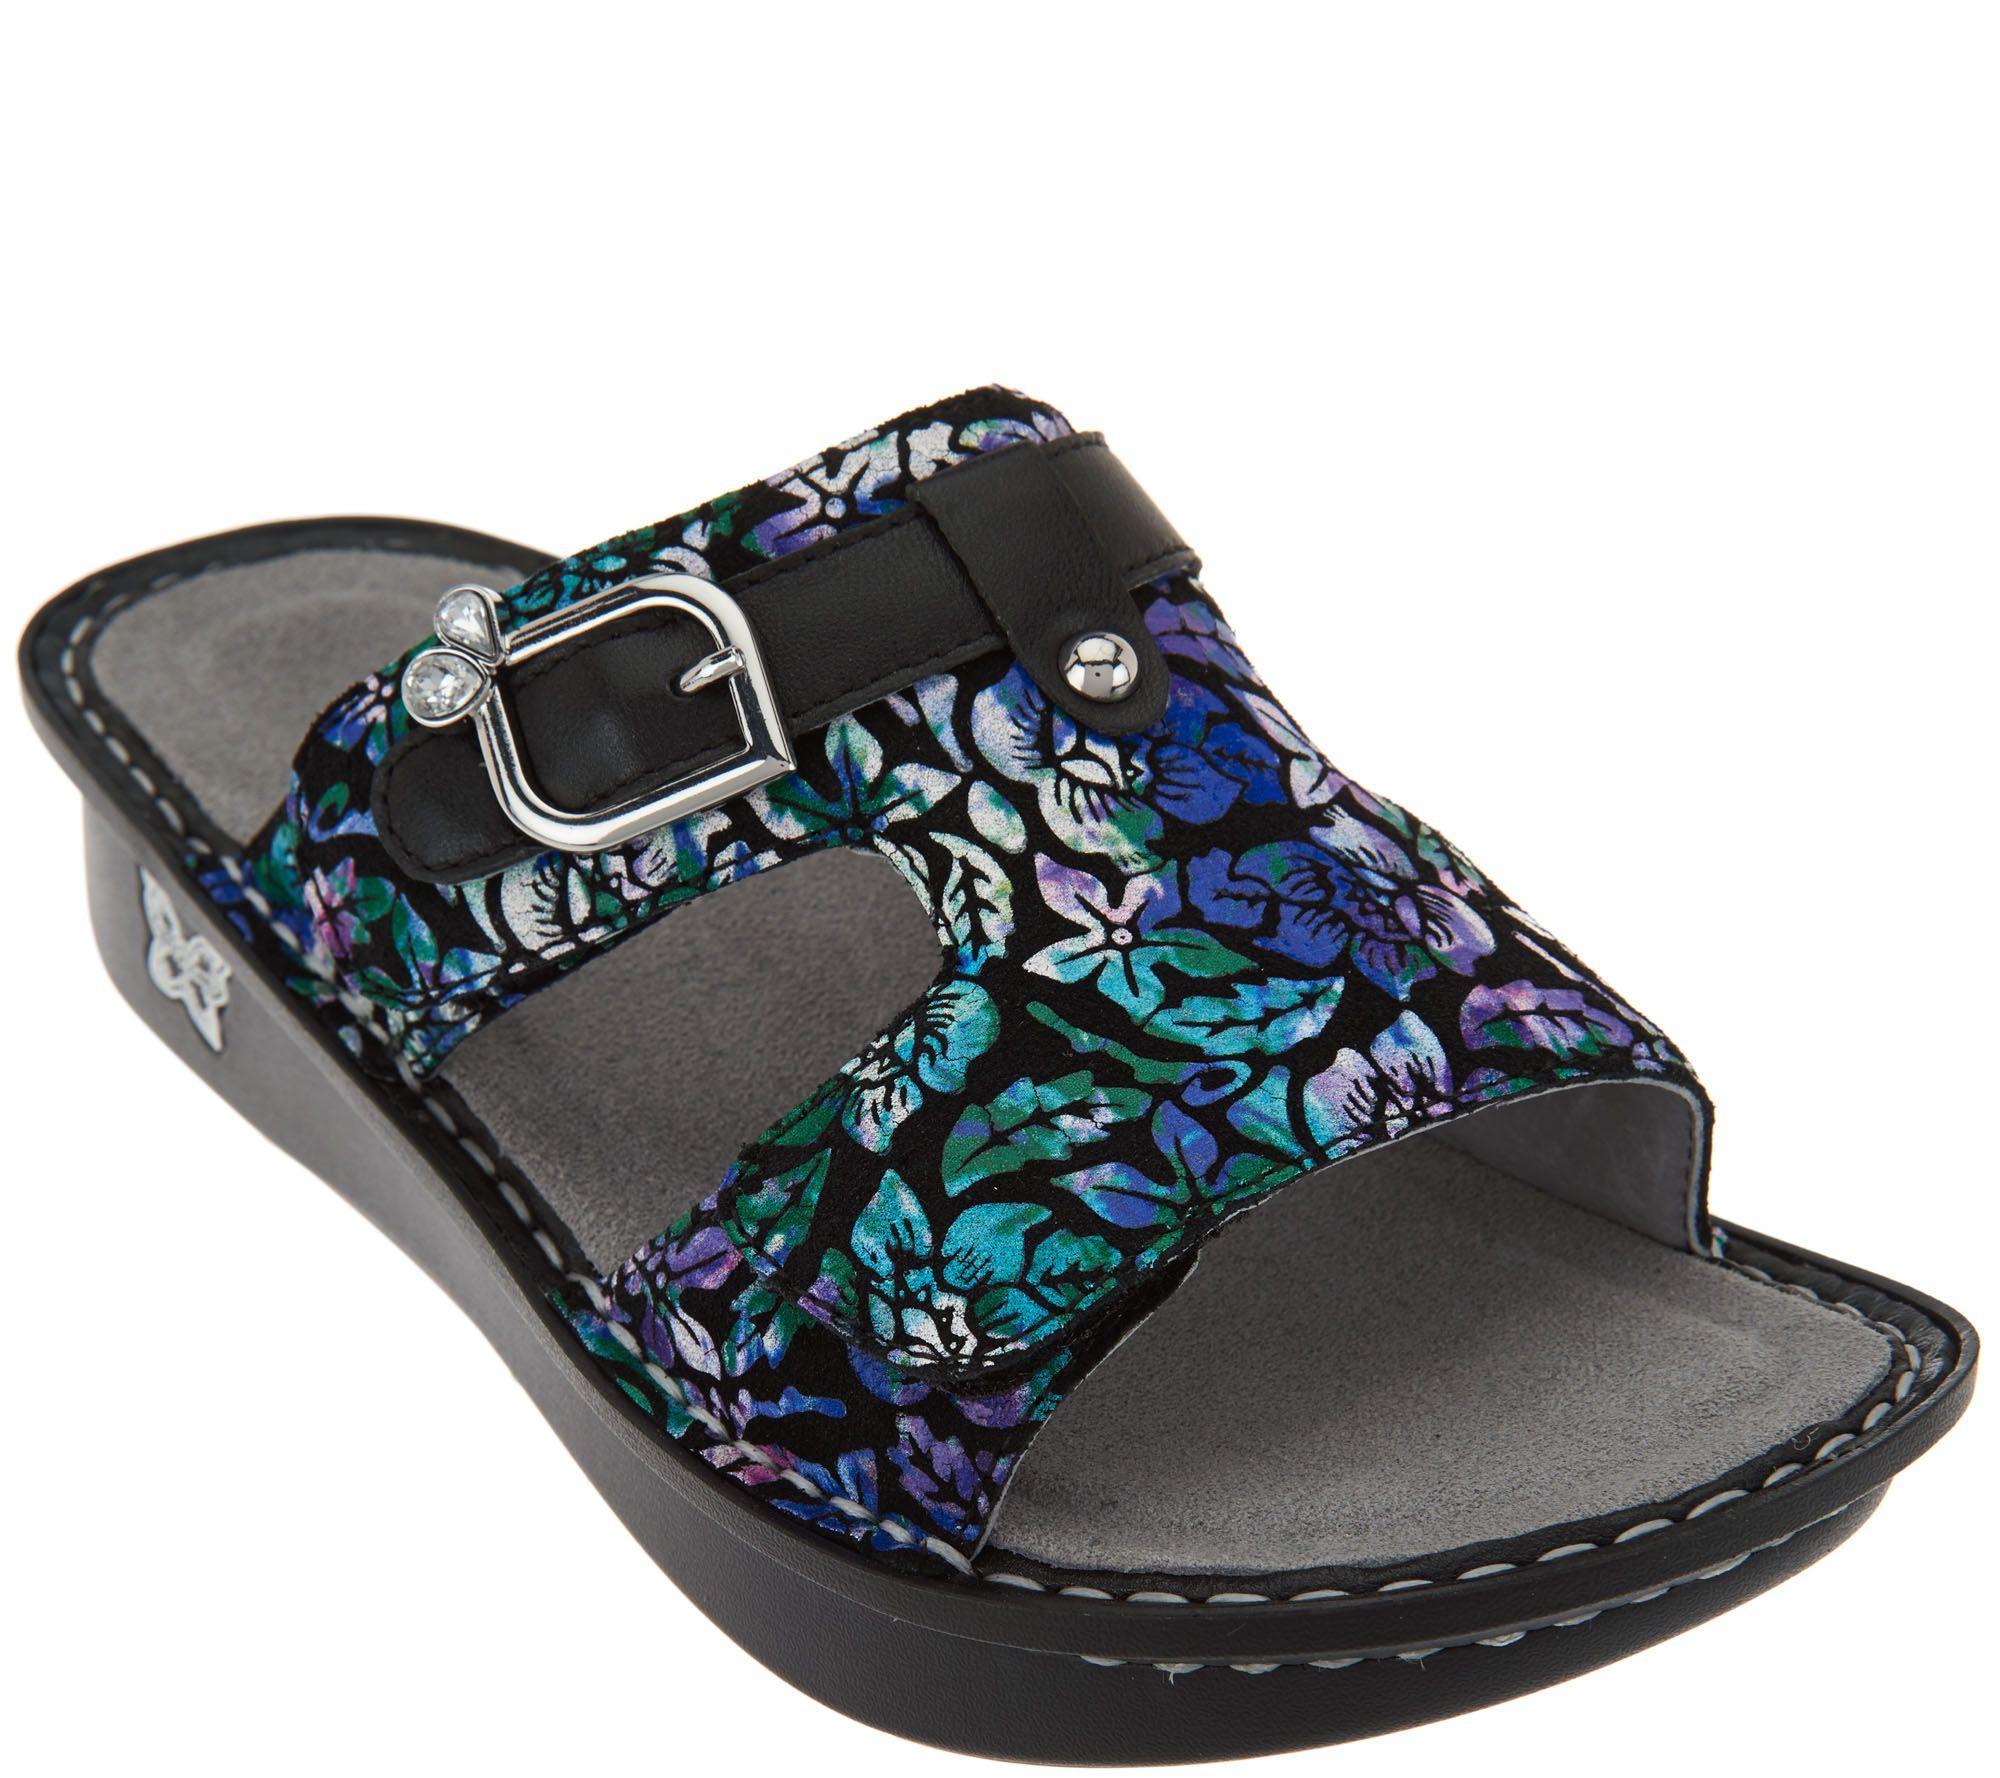 Ryka sandals shoes - Alegria Leather Adjustable Slide Sandals Peggy A287095